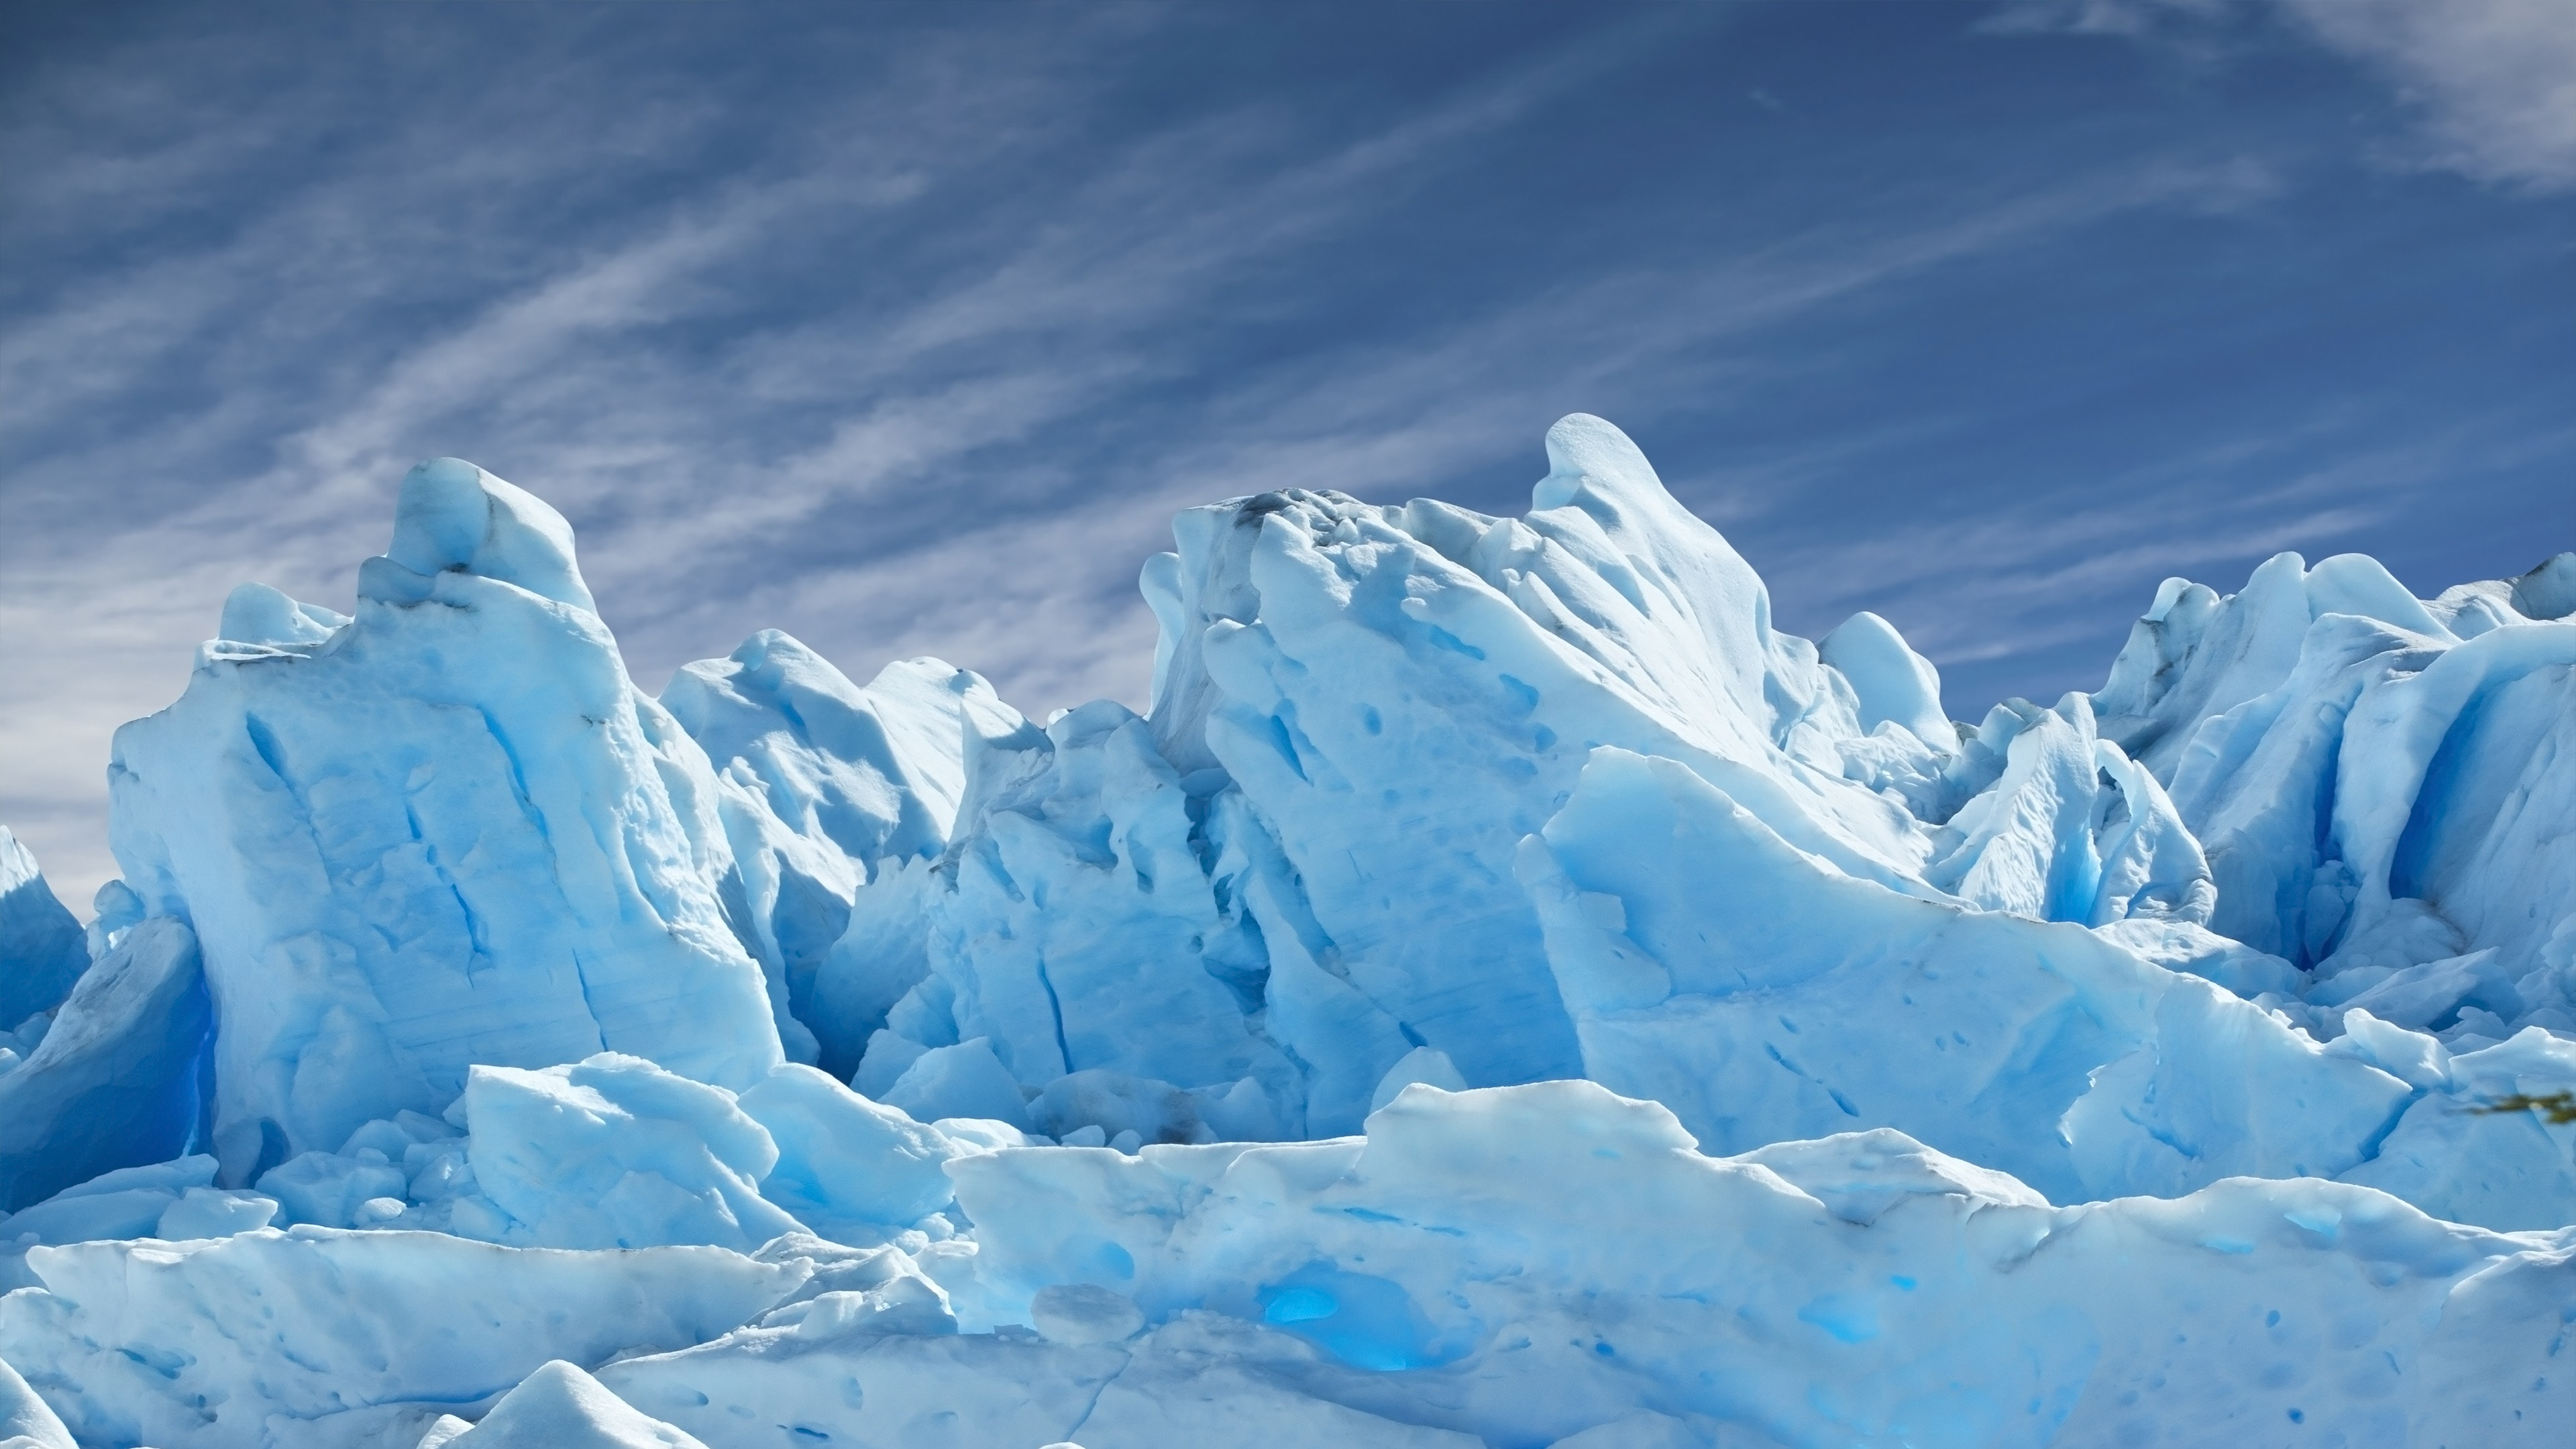 Wallpaper Rocks, 5k, 4k wallpaper, ice, snow, mountains ...